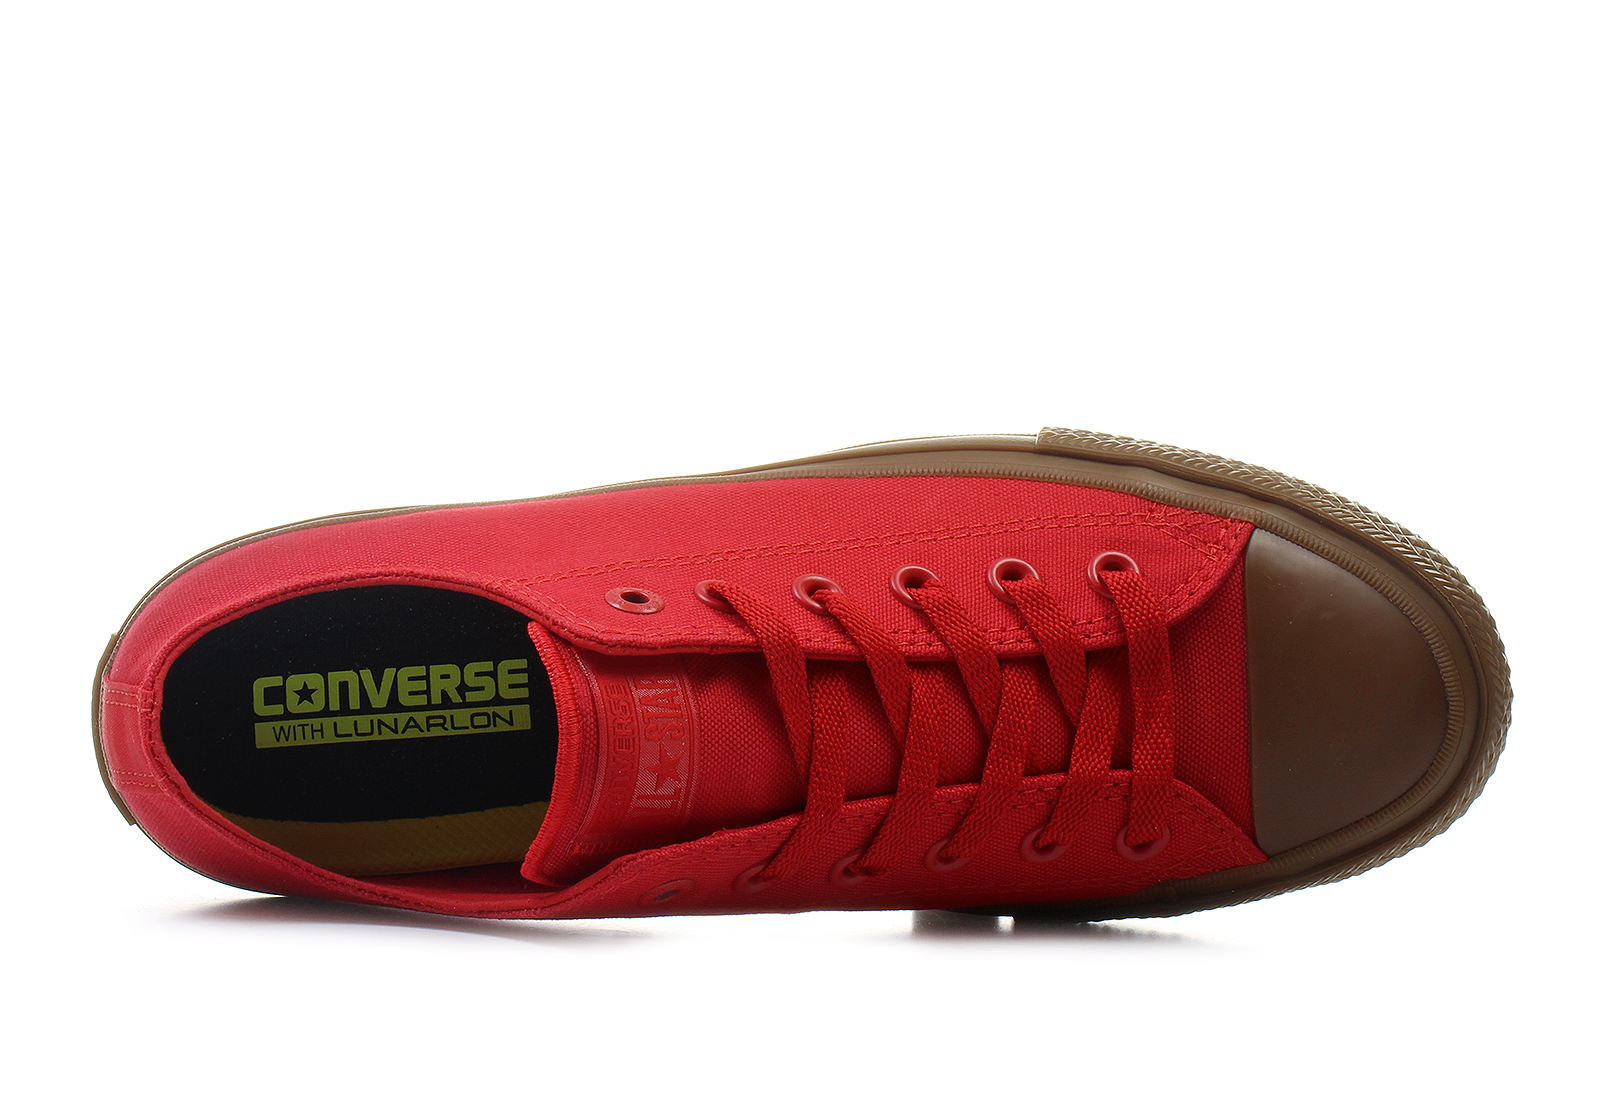 8a4211821afa Converse Sneakers - Chuck Taylor All Star II Gumsole Ox - 155499C ...